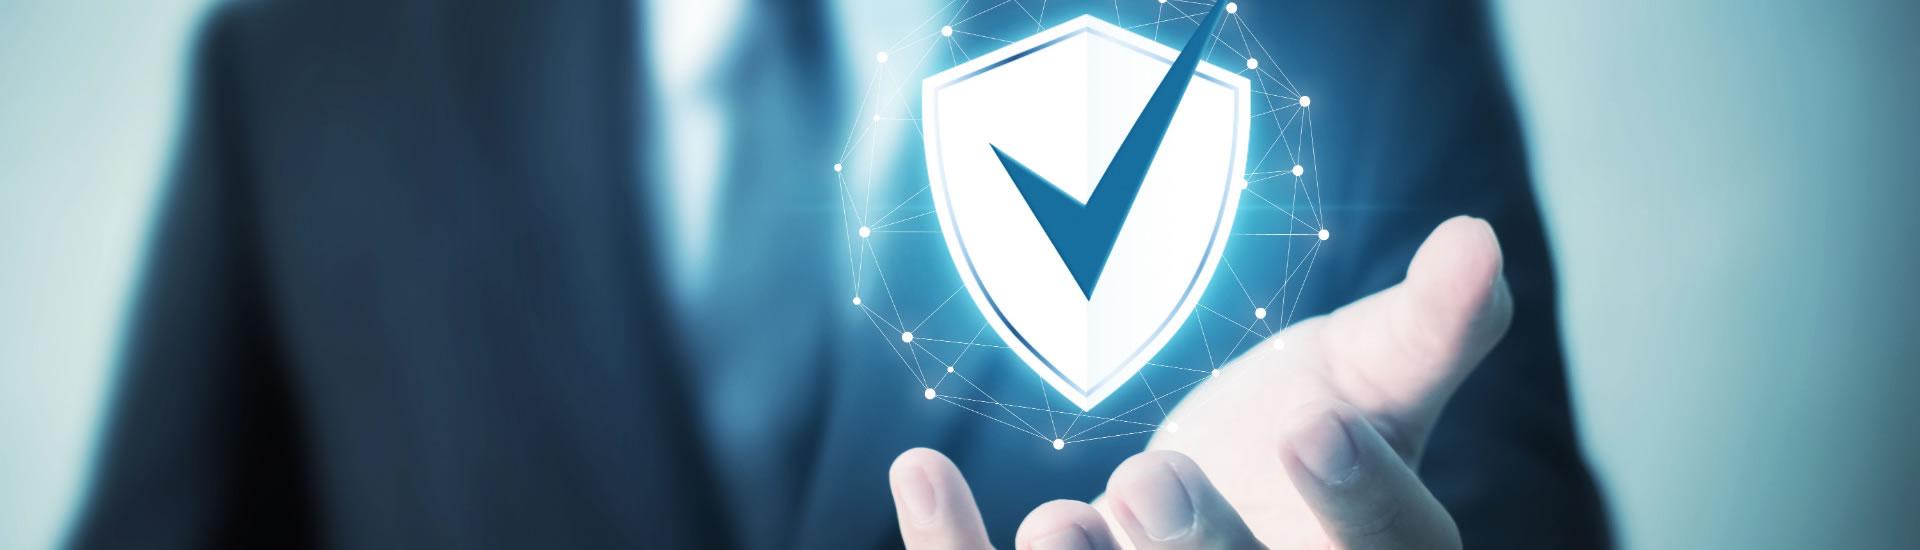 Corporate Anti-Virus Software Protection – Birmingham - Tek-nology Solutions